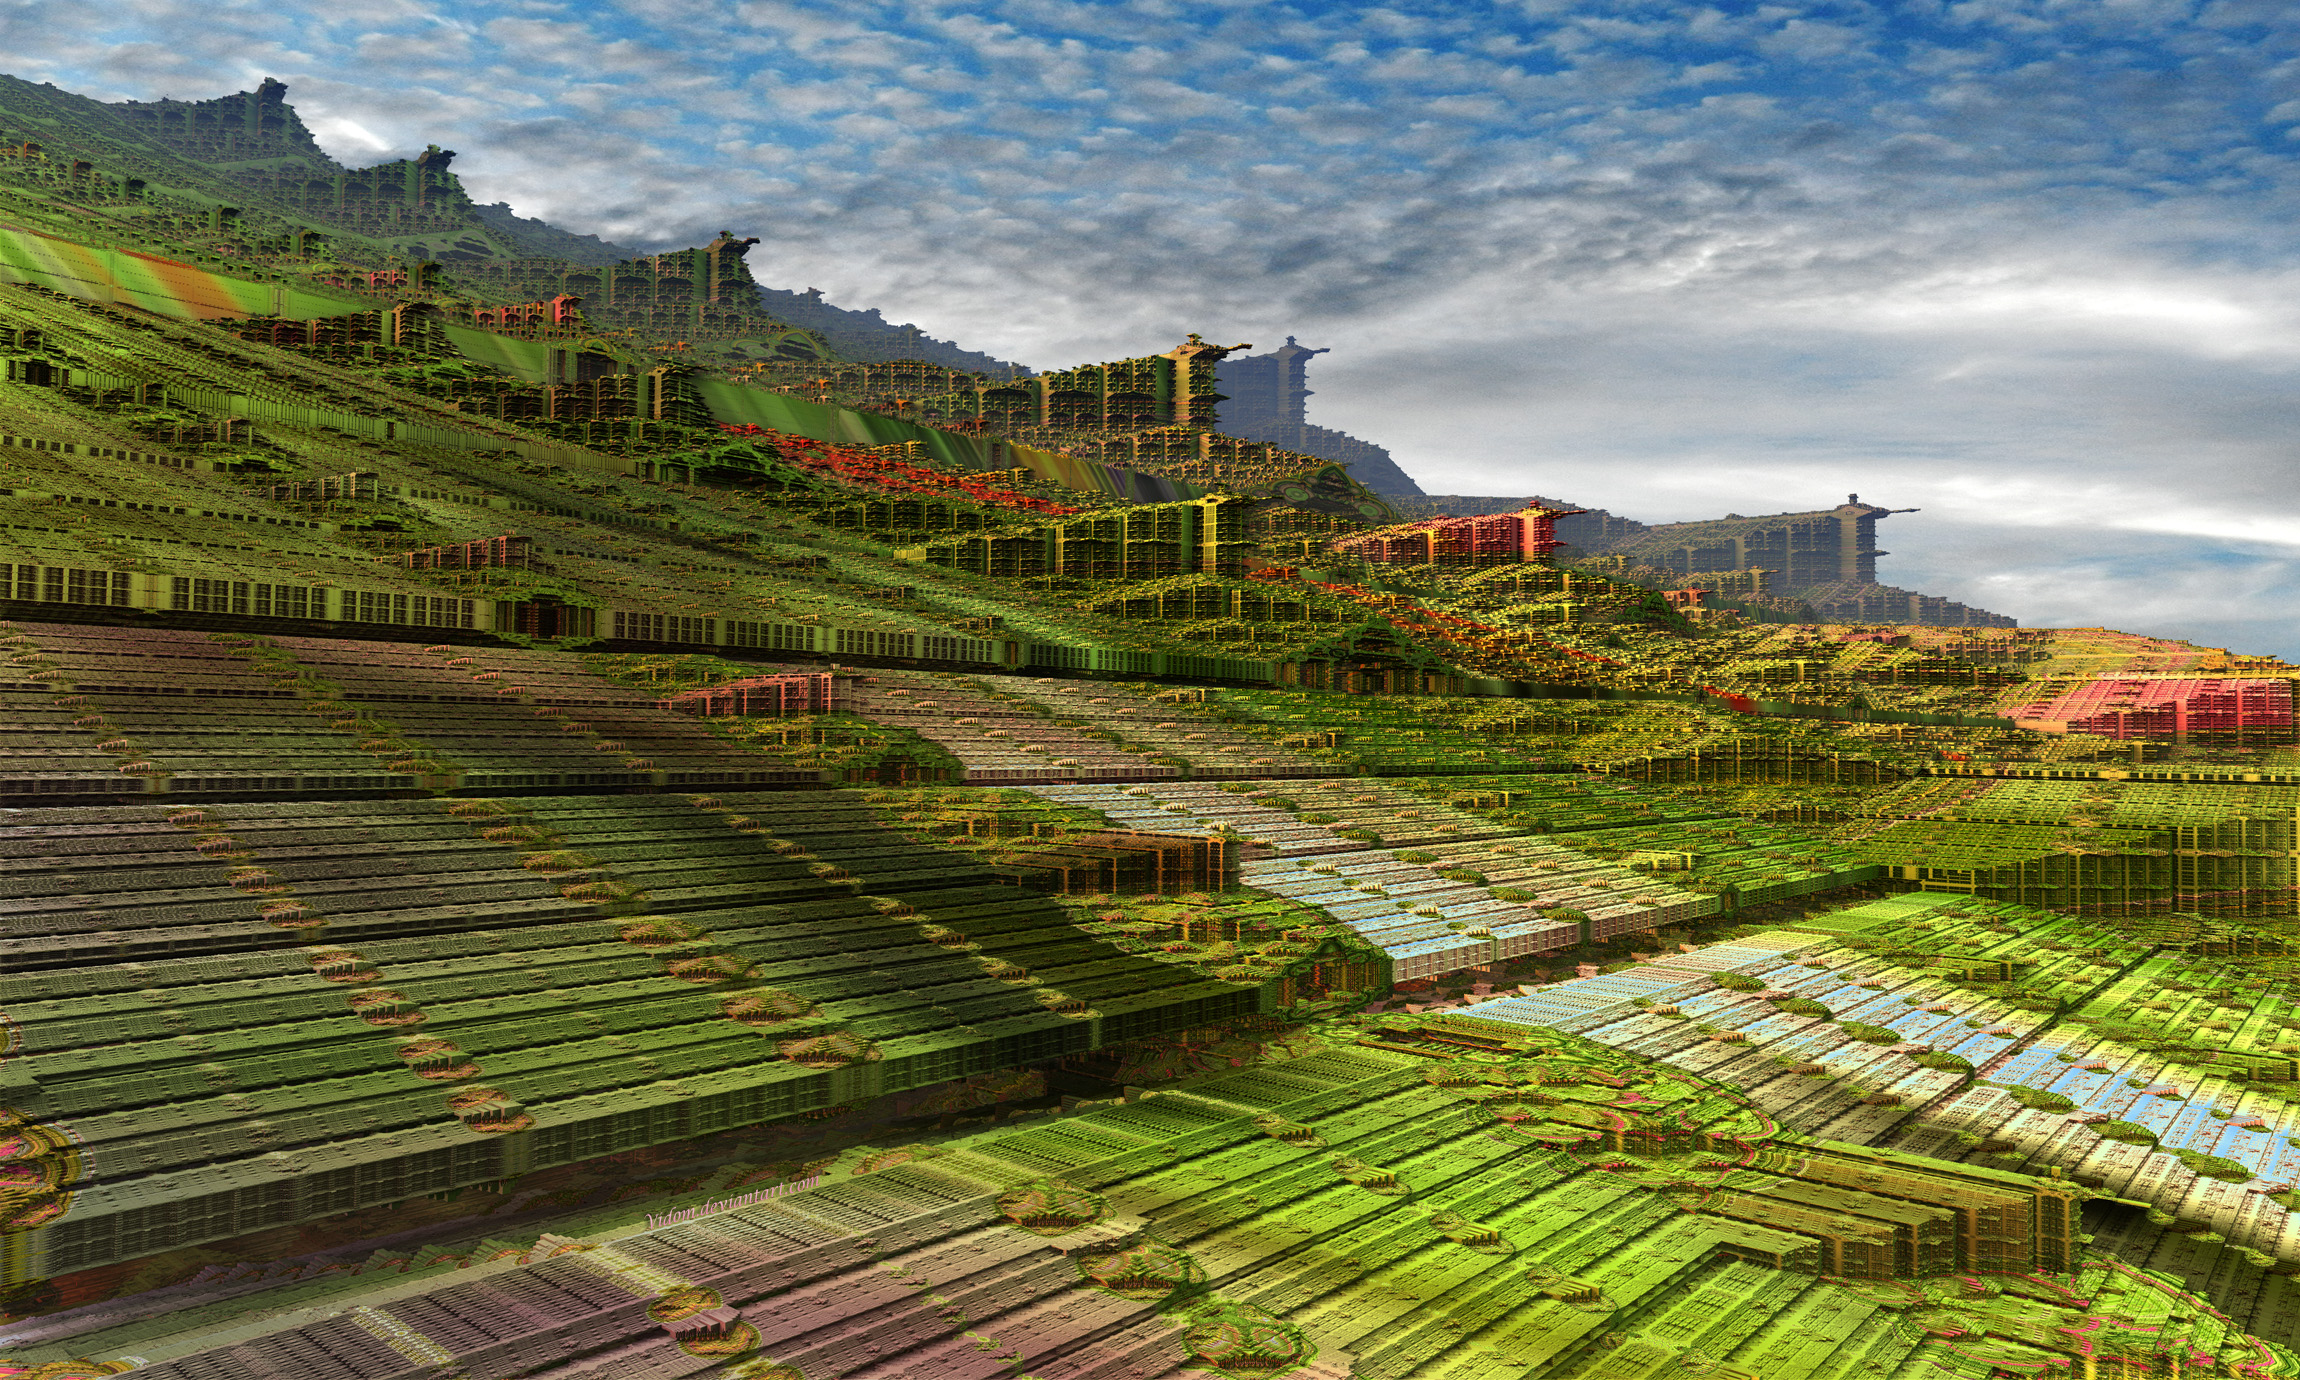 Pythagorean gardens and village by Vidom